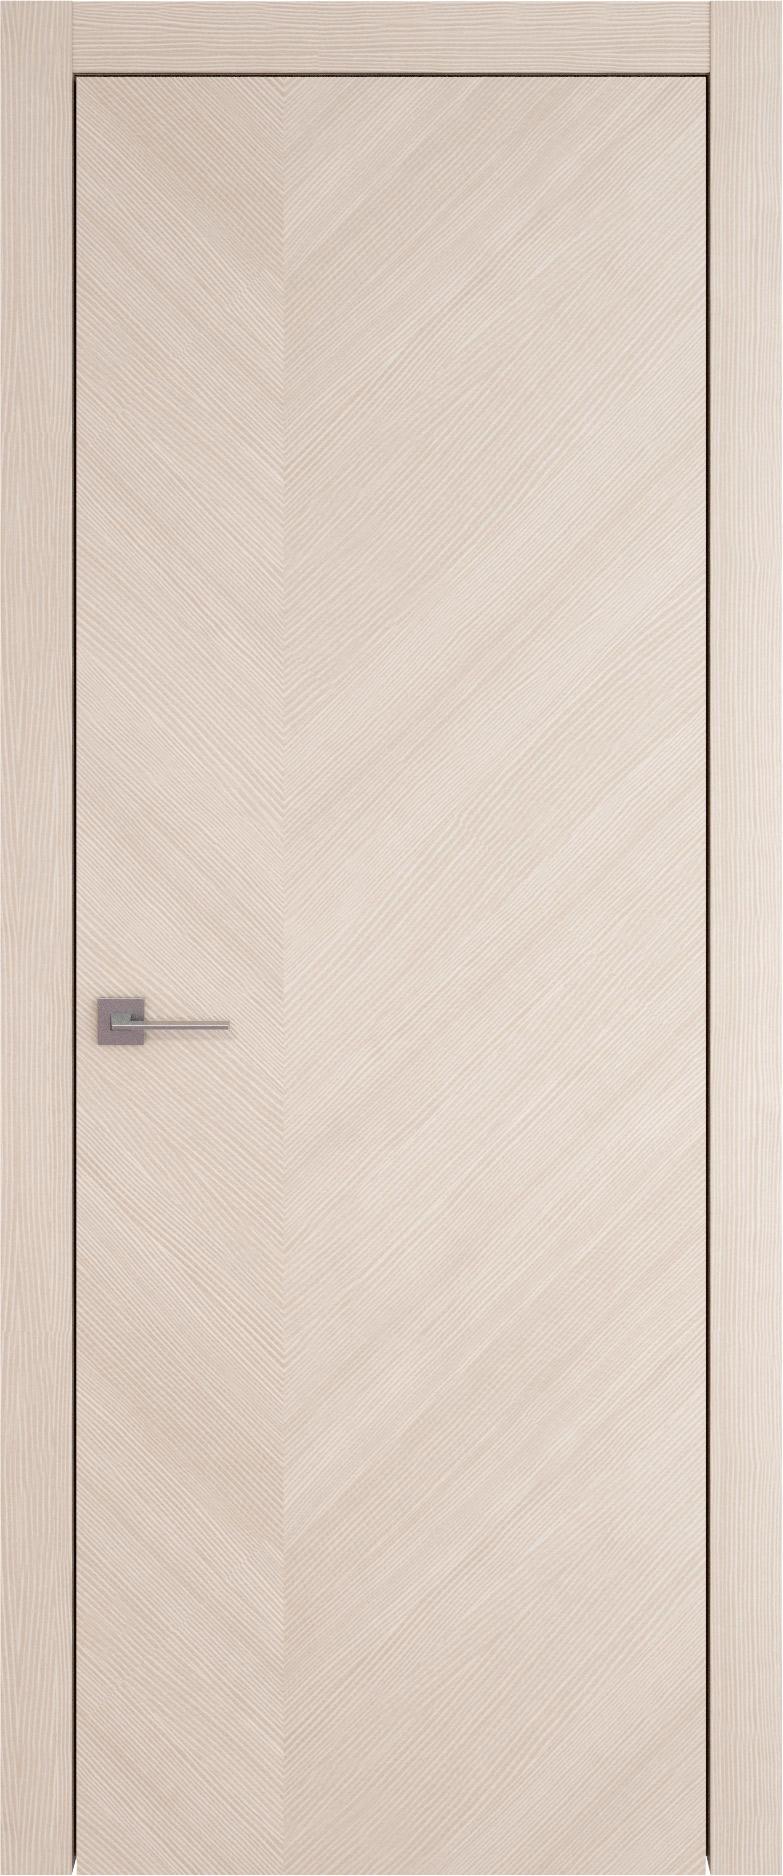 Tivoli Л-1 цвет - Беленый дуб Без стекла (ДГ)